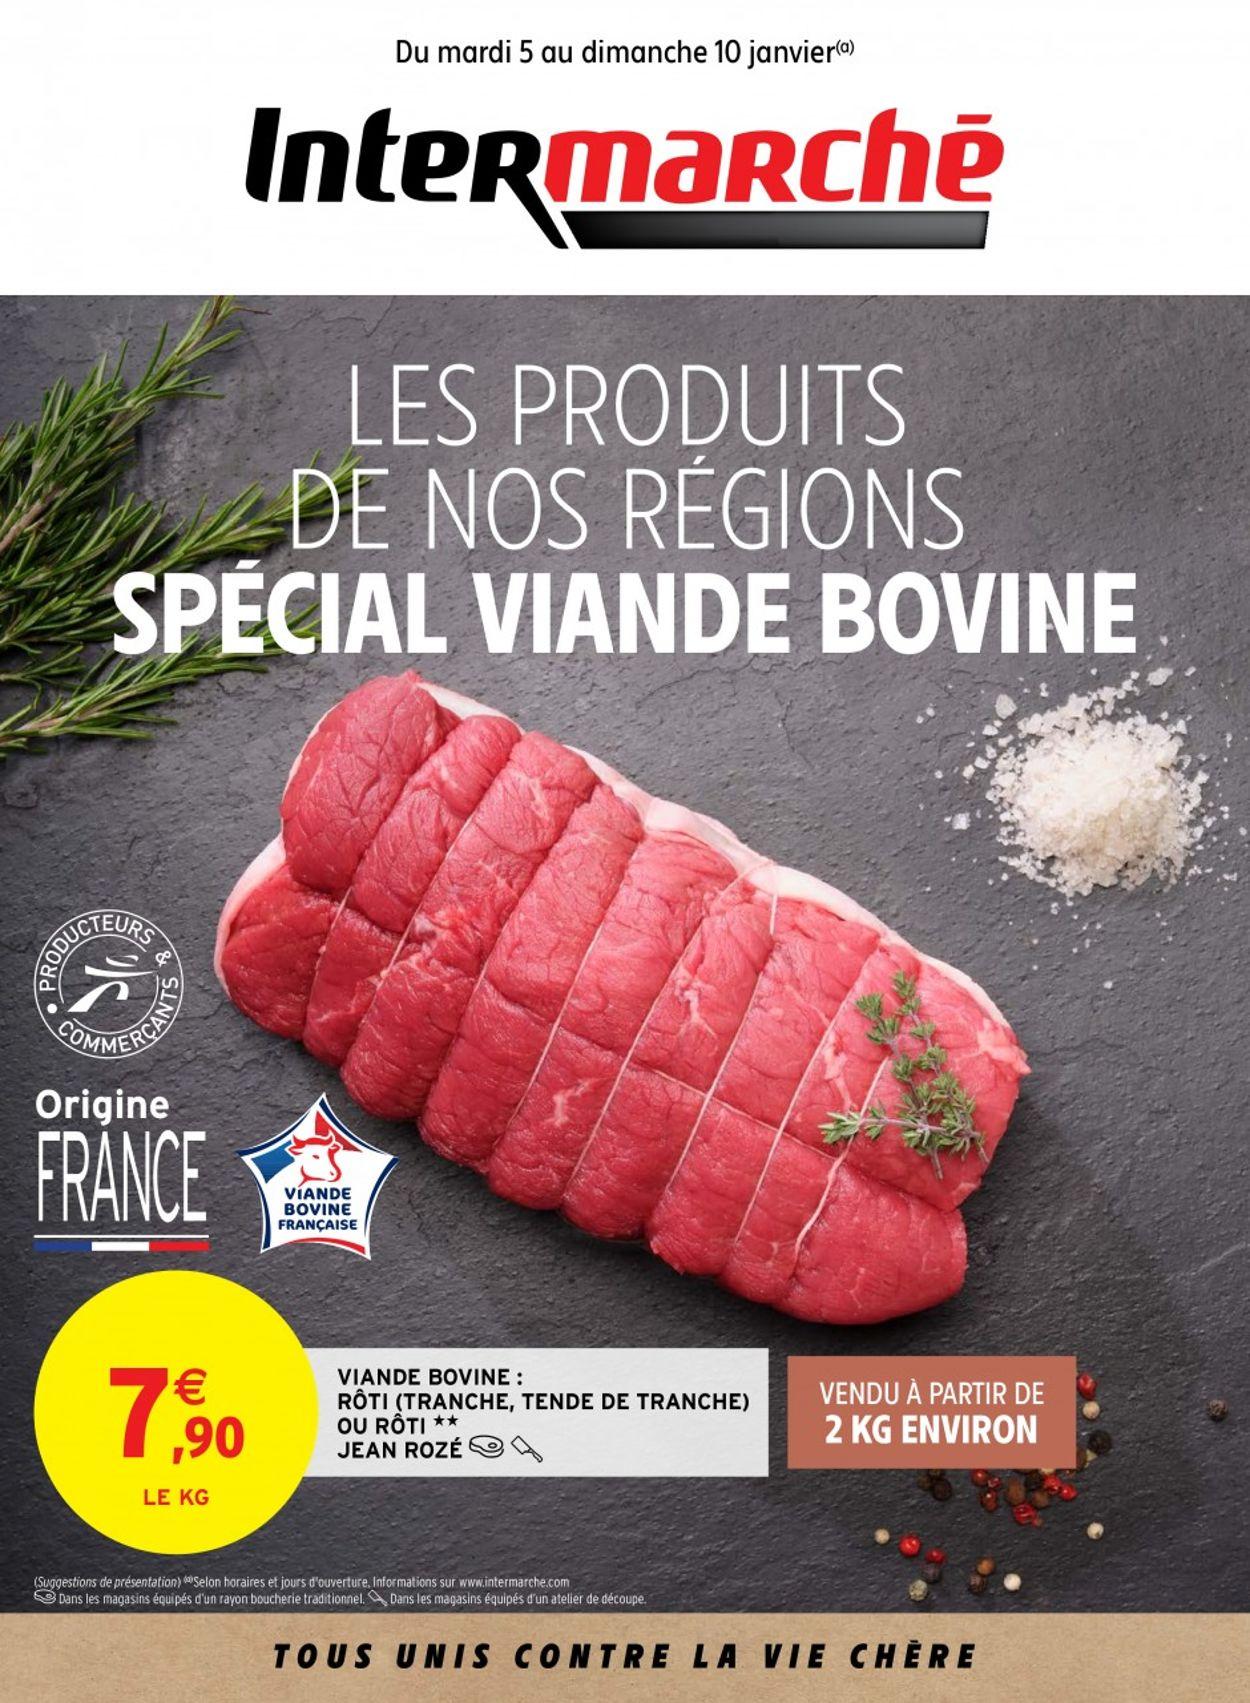 Intermarché SPÉCIAL Viande Bovine 2021 Catalogue - 05.01-10.01.2021